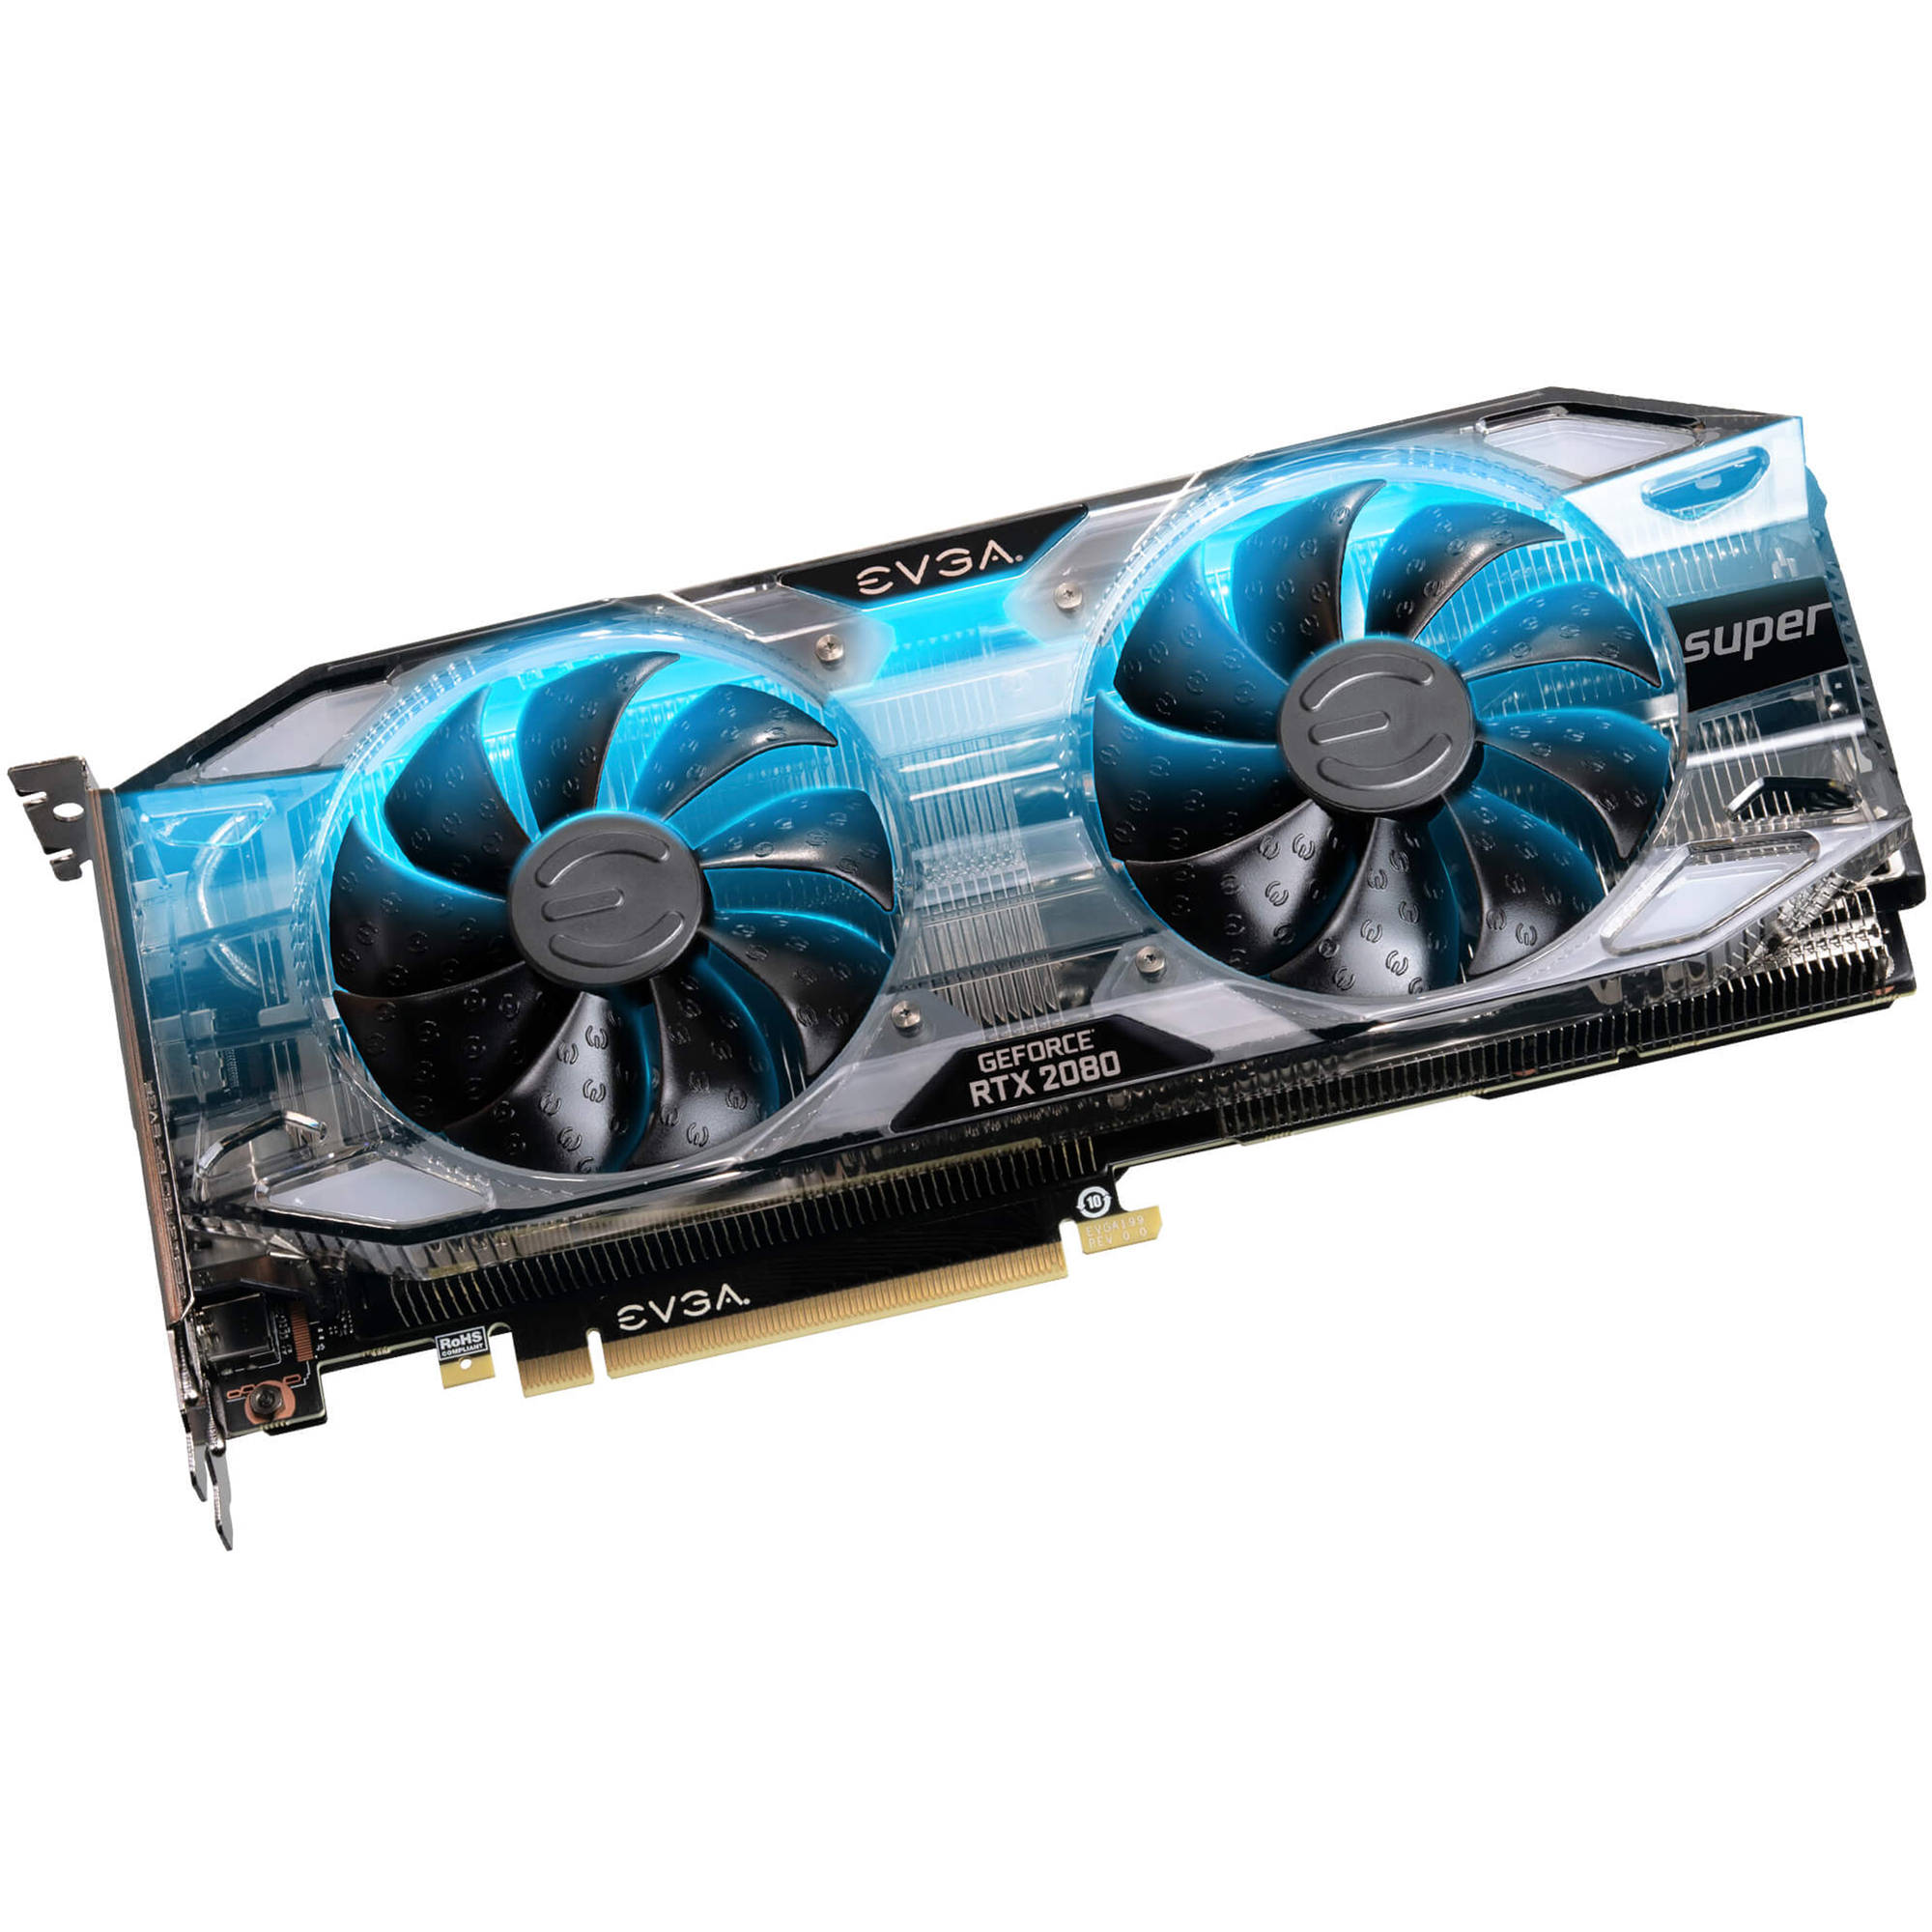 EVGA GeForce RTX 2080 SUPER XC GAMING Graphics Card